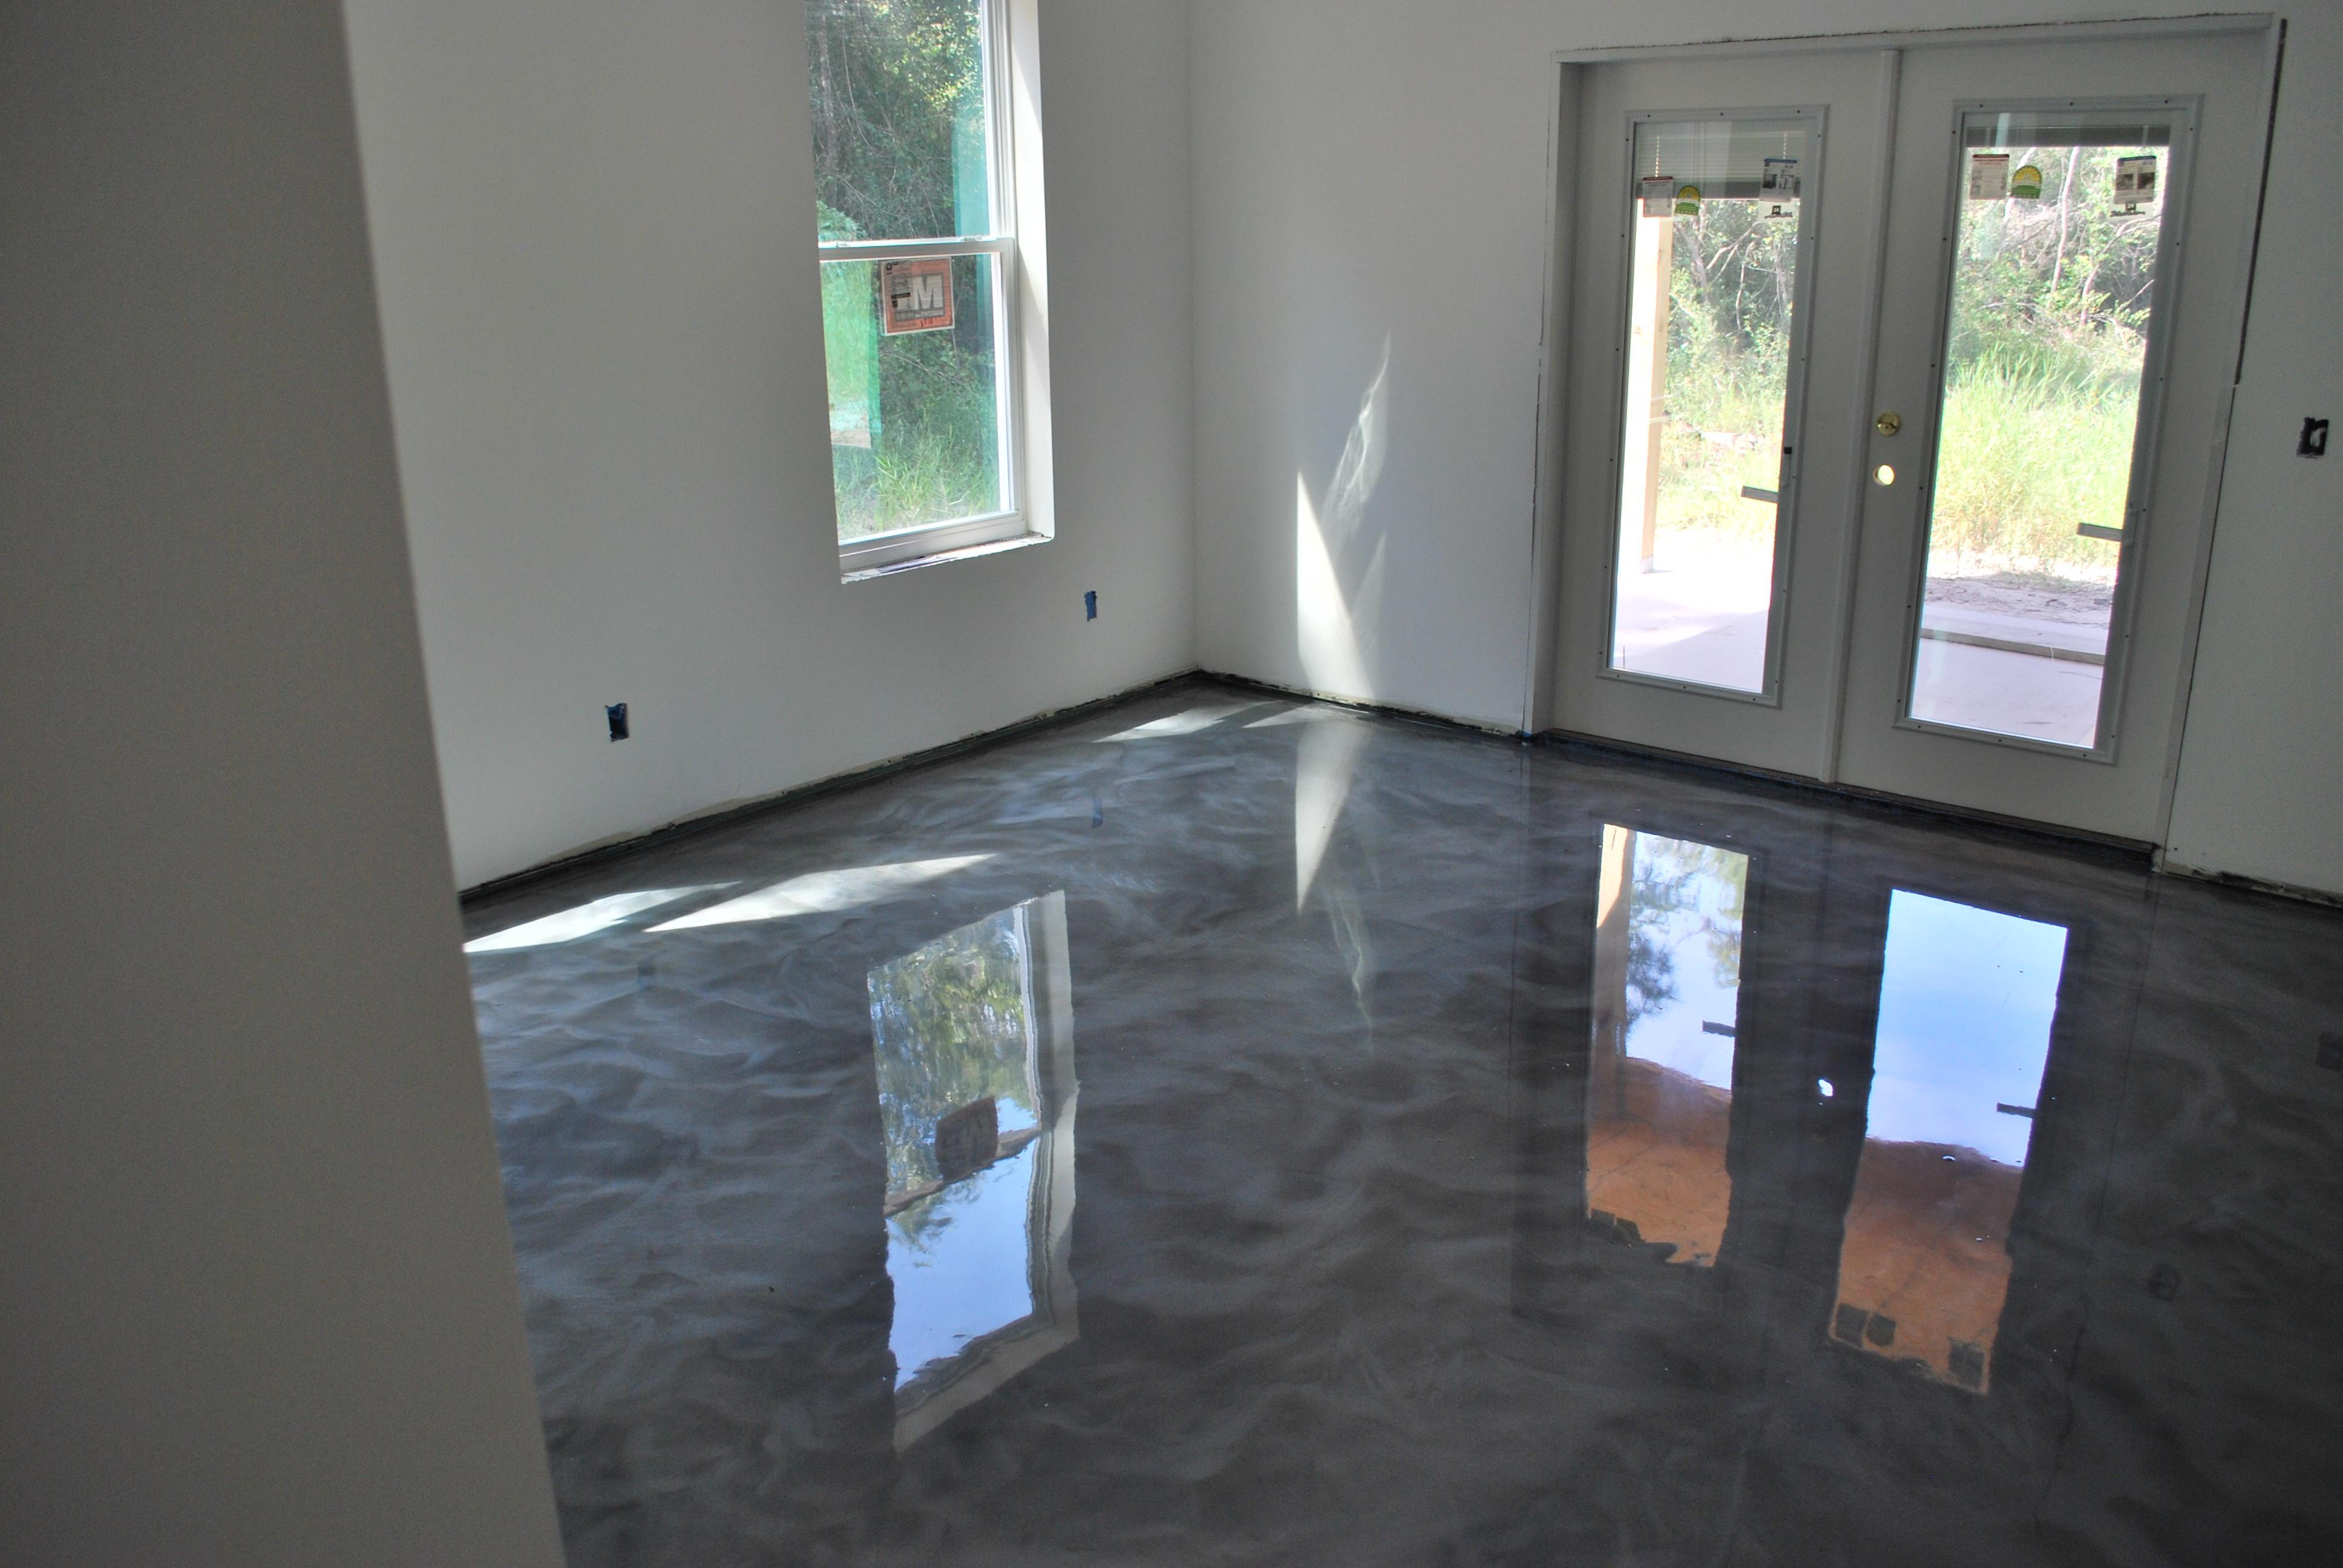 epoxy vs tile kitchen floor 2 tile for kitchen floor Epoxy vs tile kitchen floor dsc